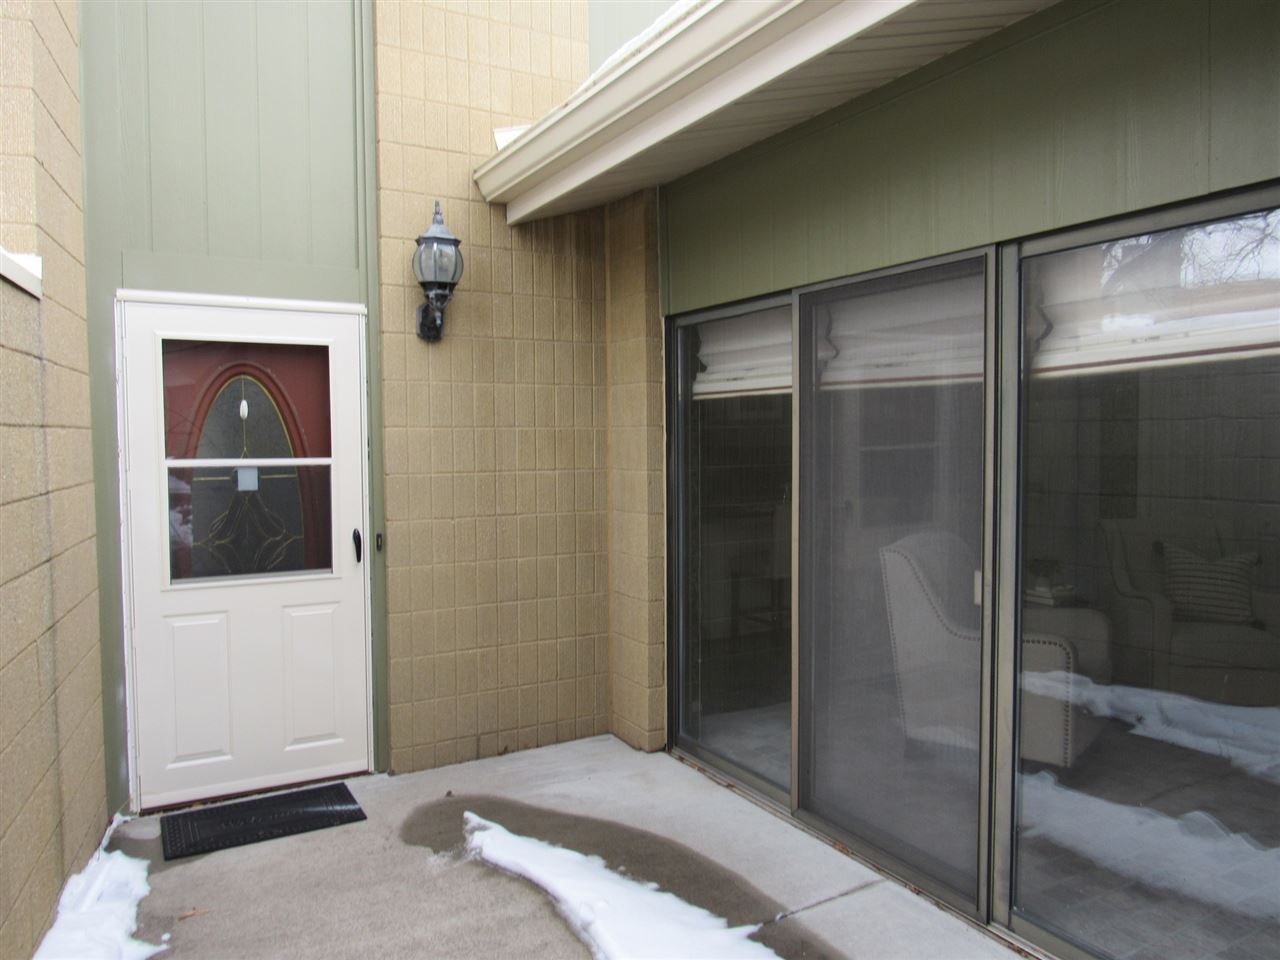 Photo of 1231 W NICOLET Circle, APPLETON, WI 54914 (MLS # 50229345)